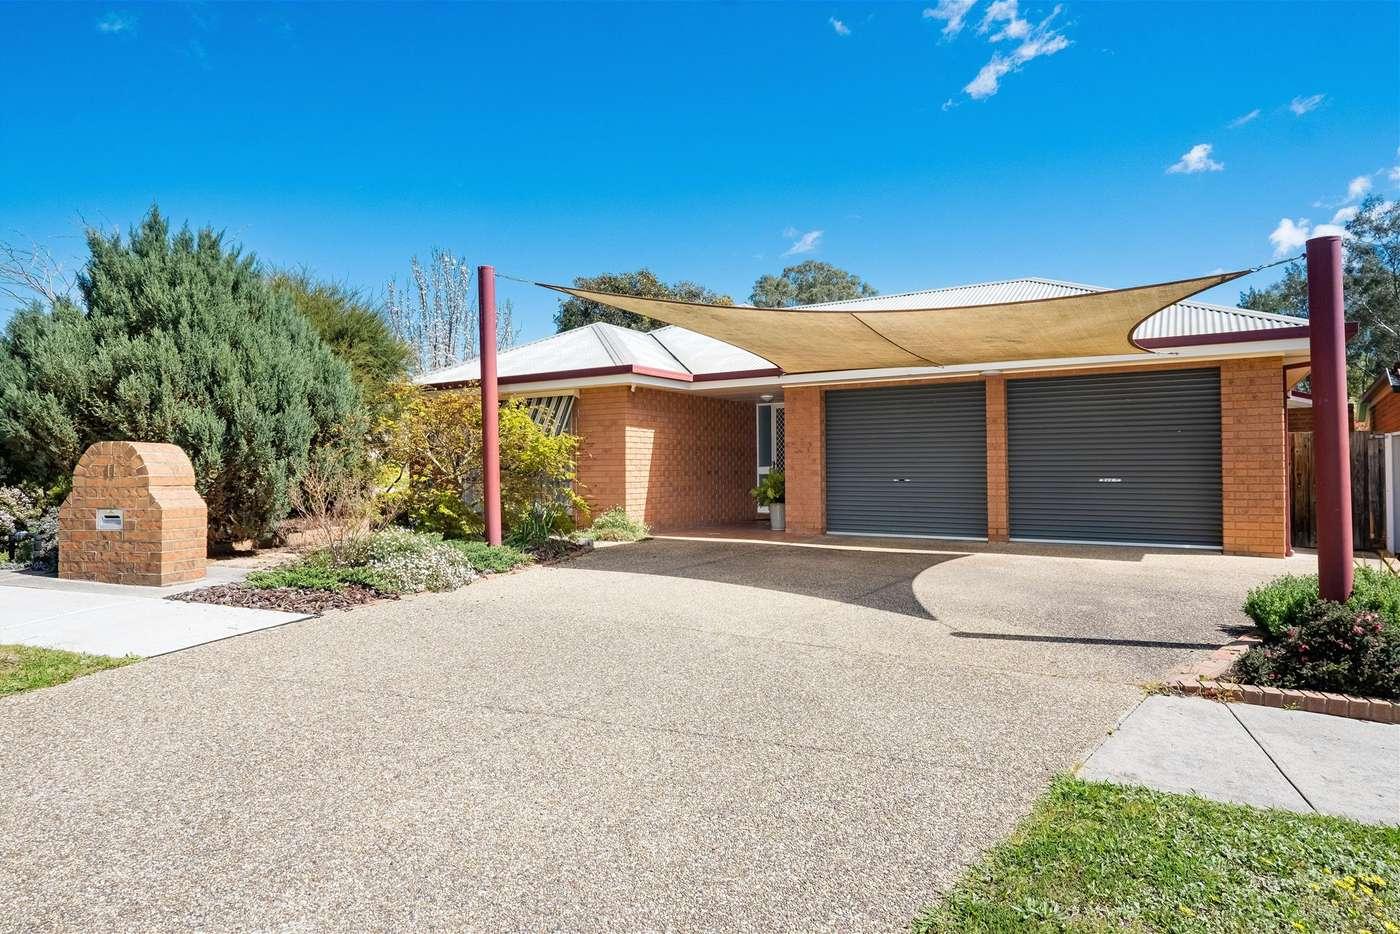 Main view of Homely house listing, 11 Howqua Circuit, Wodonga VIC 3690